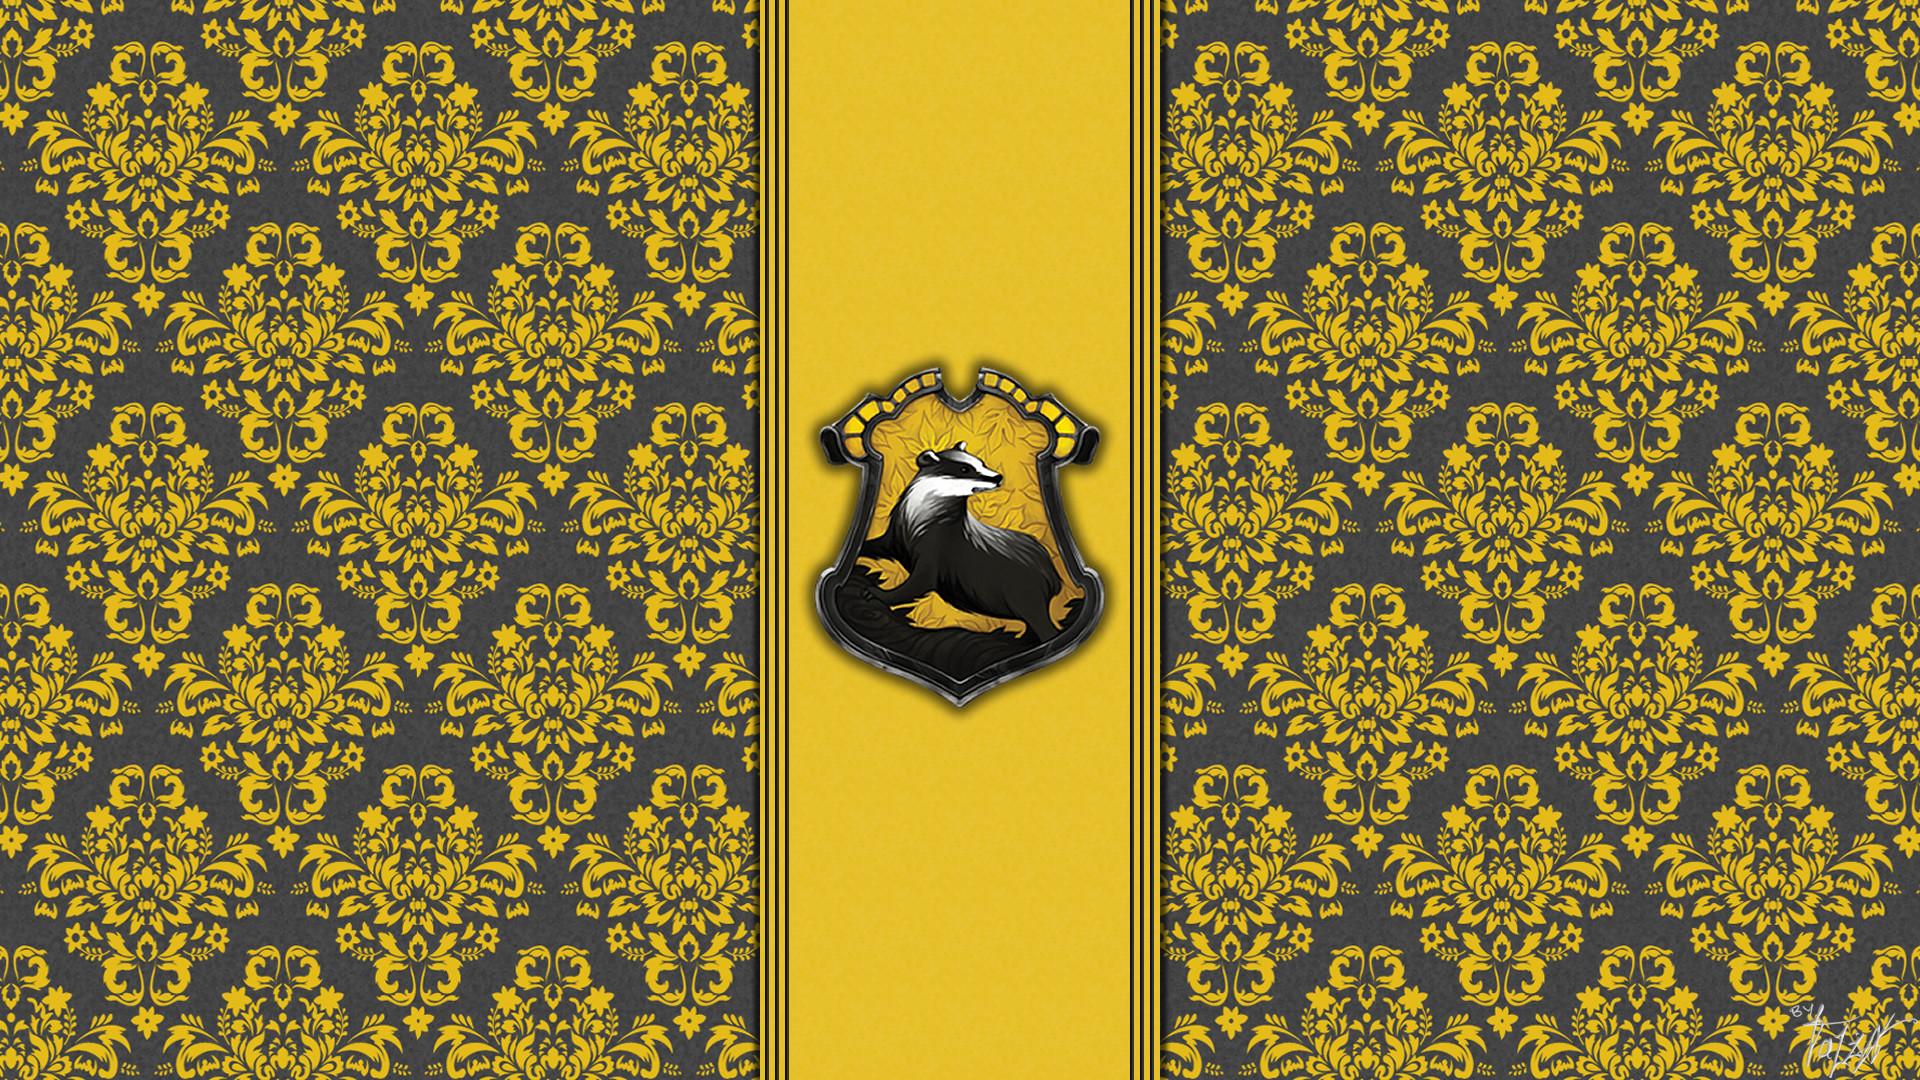 House hufflepuff wallpaper hogwarts paper art theladyavatar   Harry Potter    Pinterest   Colors, Paper and Desktop wallpapers